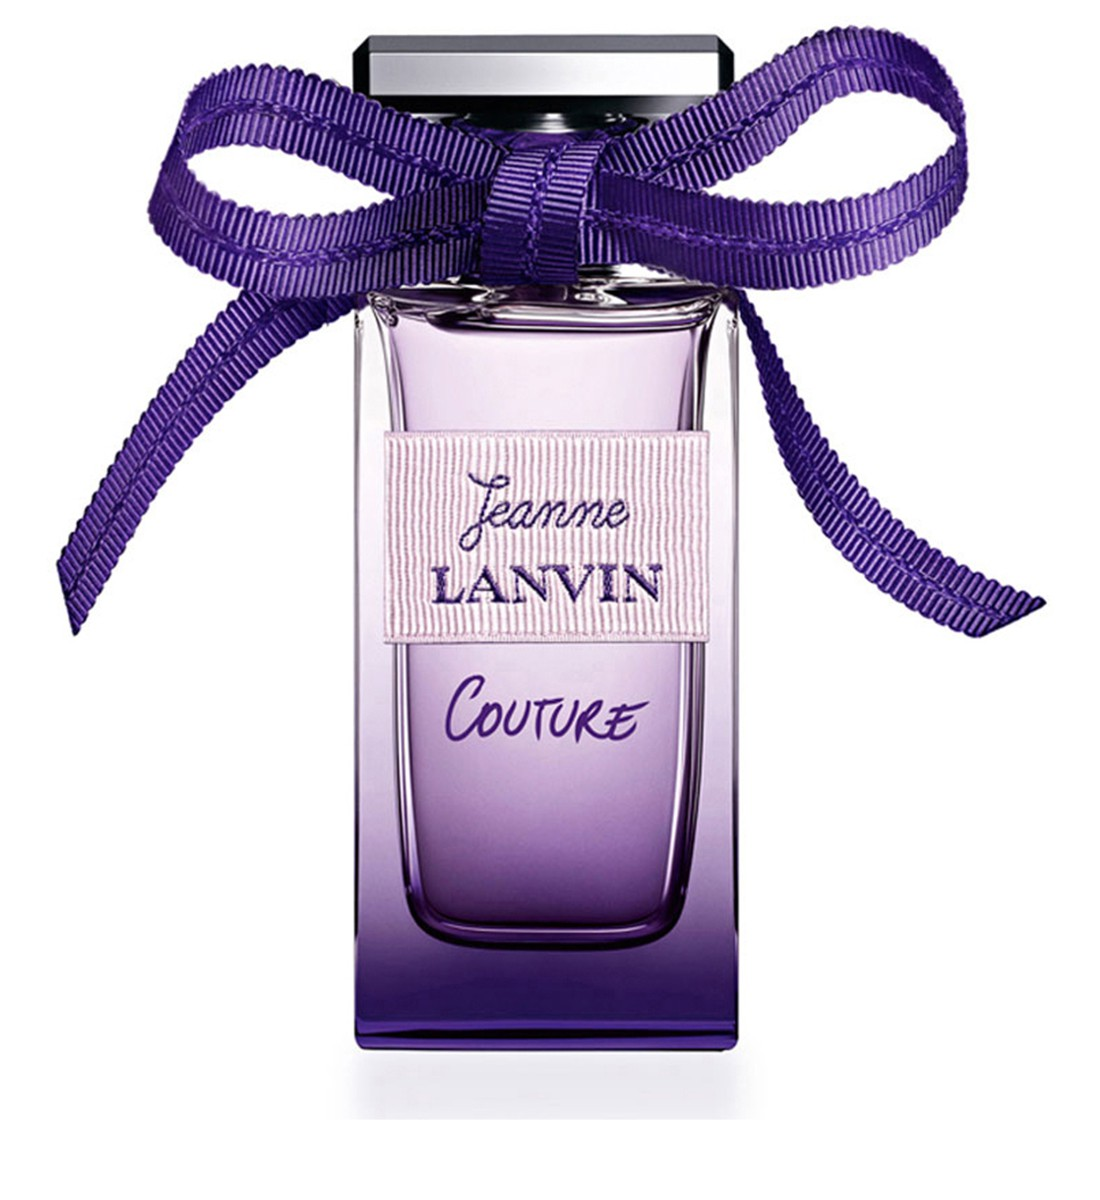 Jeanne Lanvin Couture аромат для женщин